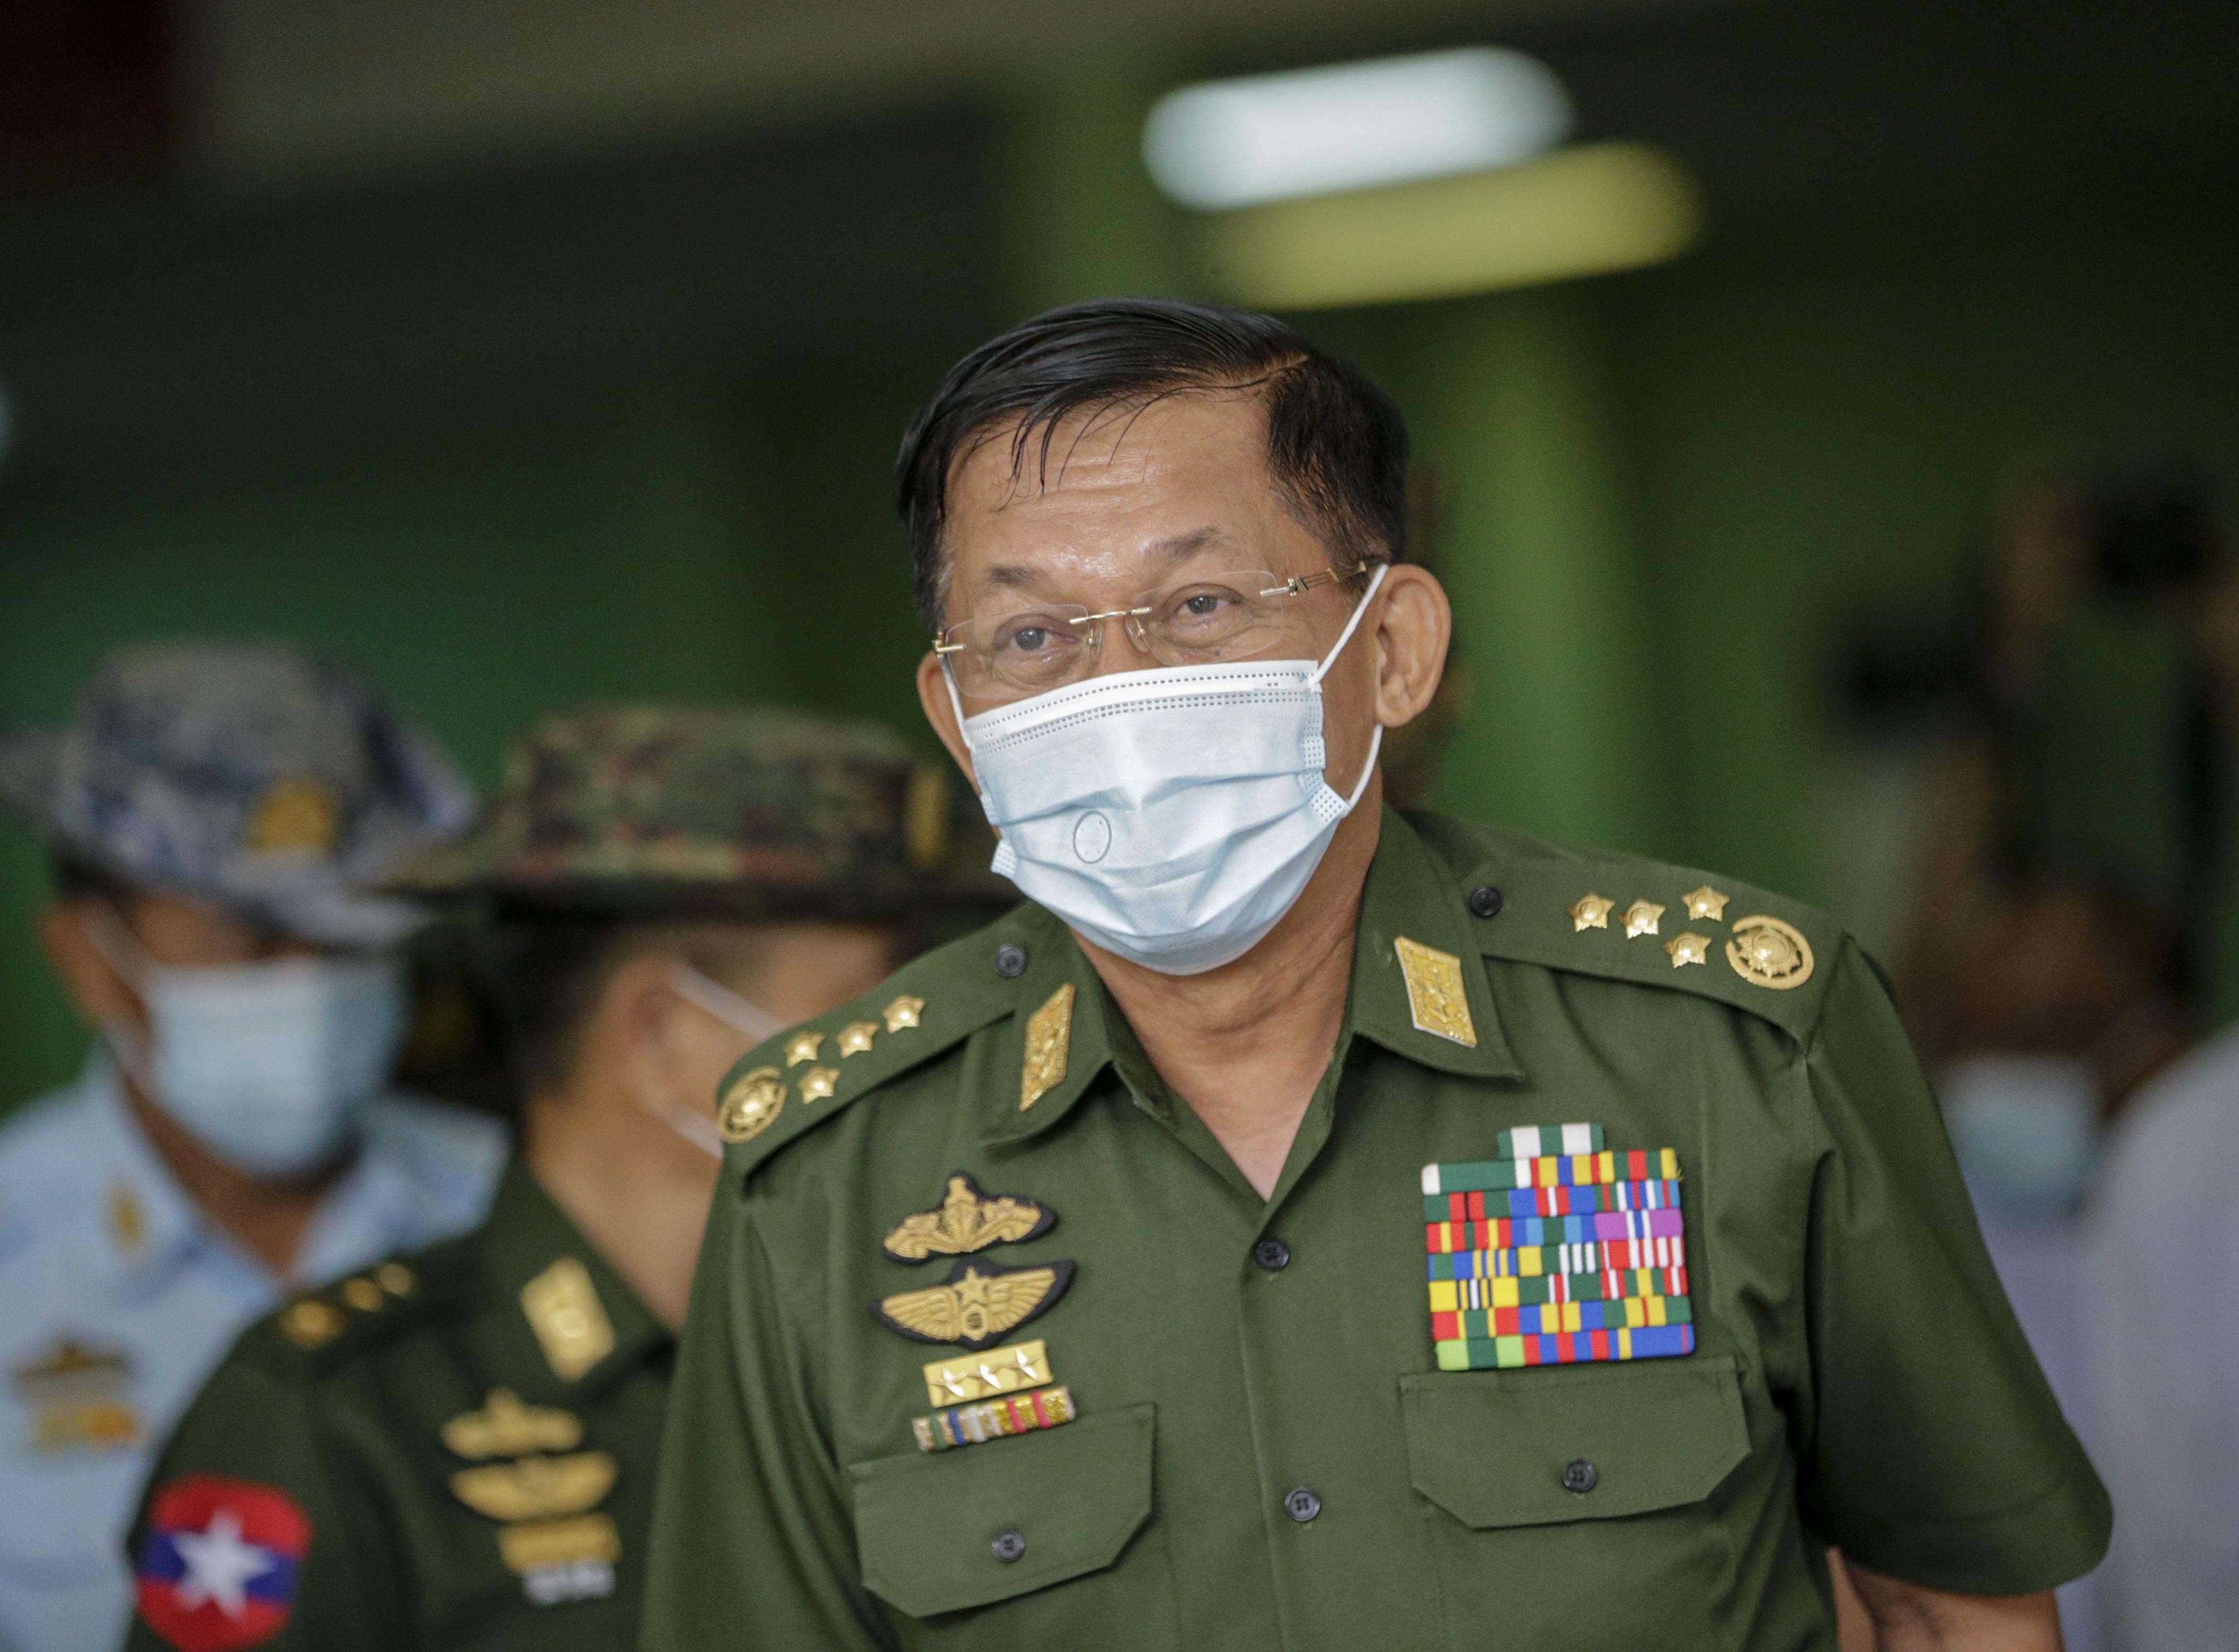 El general Min Aung Hlaing, jefe del Ejército birmano.